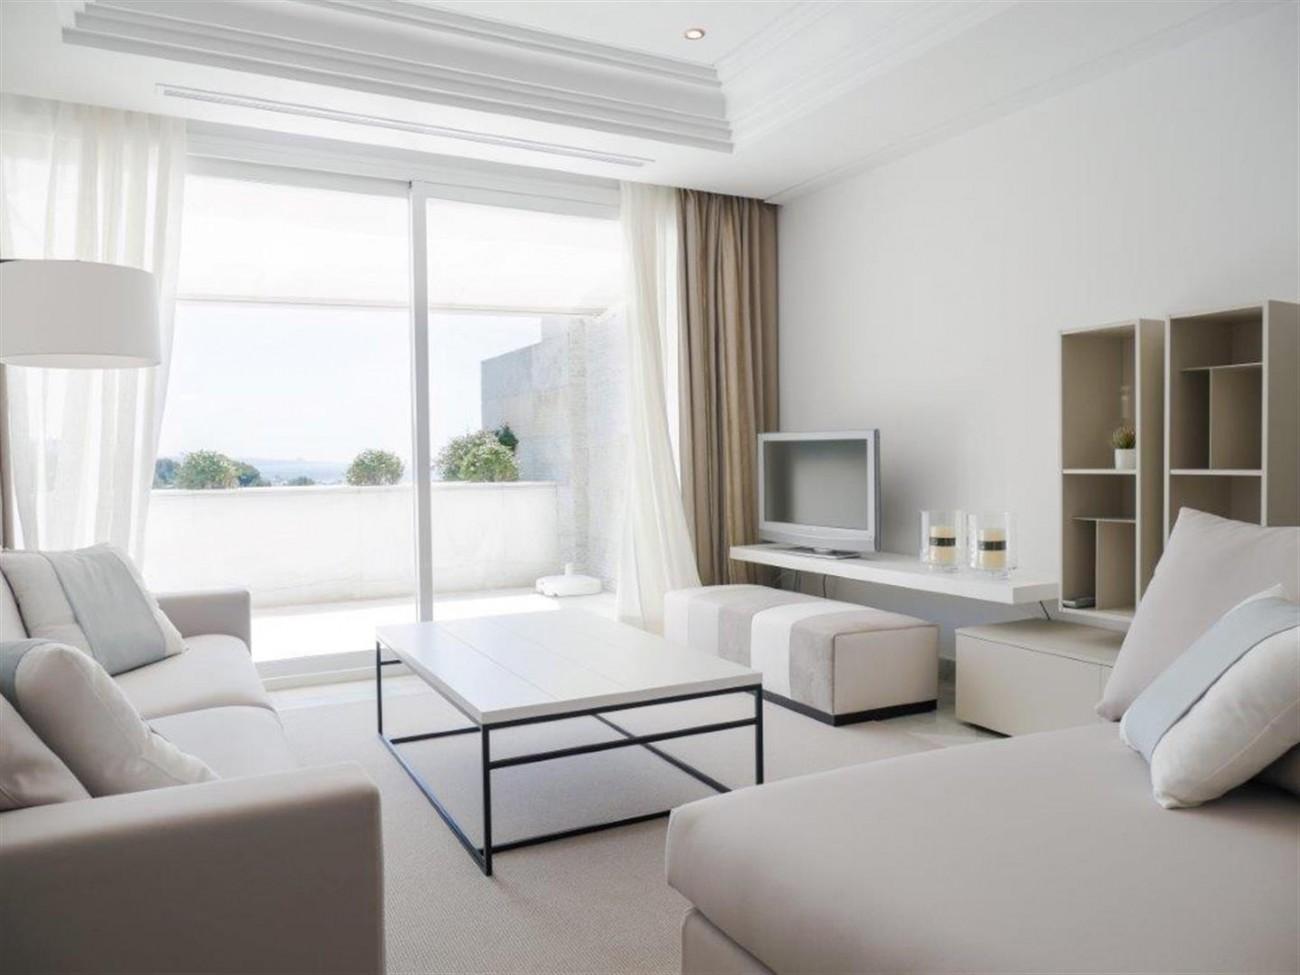 A5579 Frontline beach duplex penthouse Marbella 7 (Large)